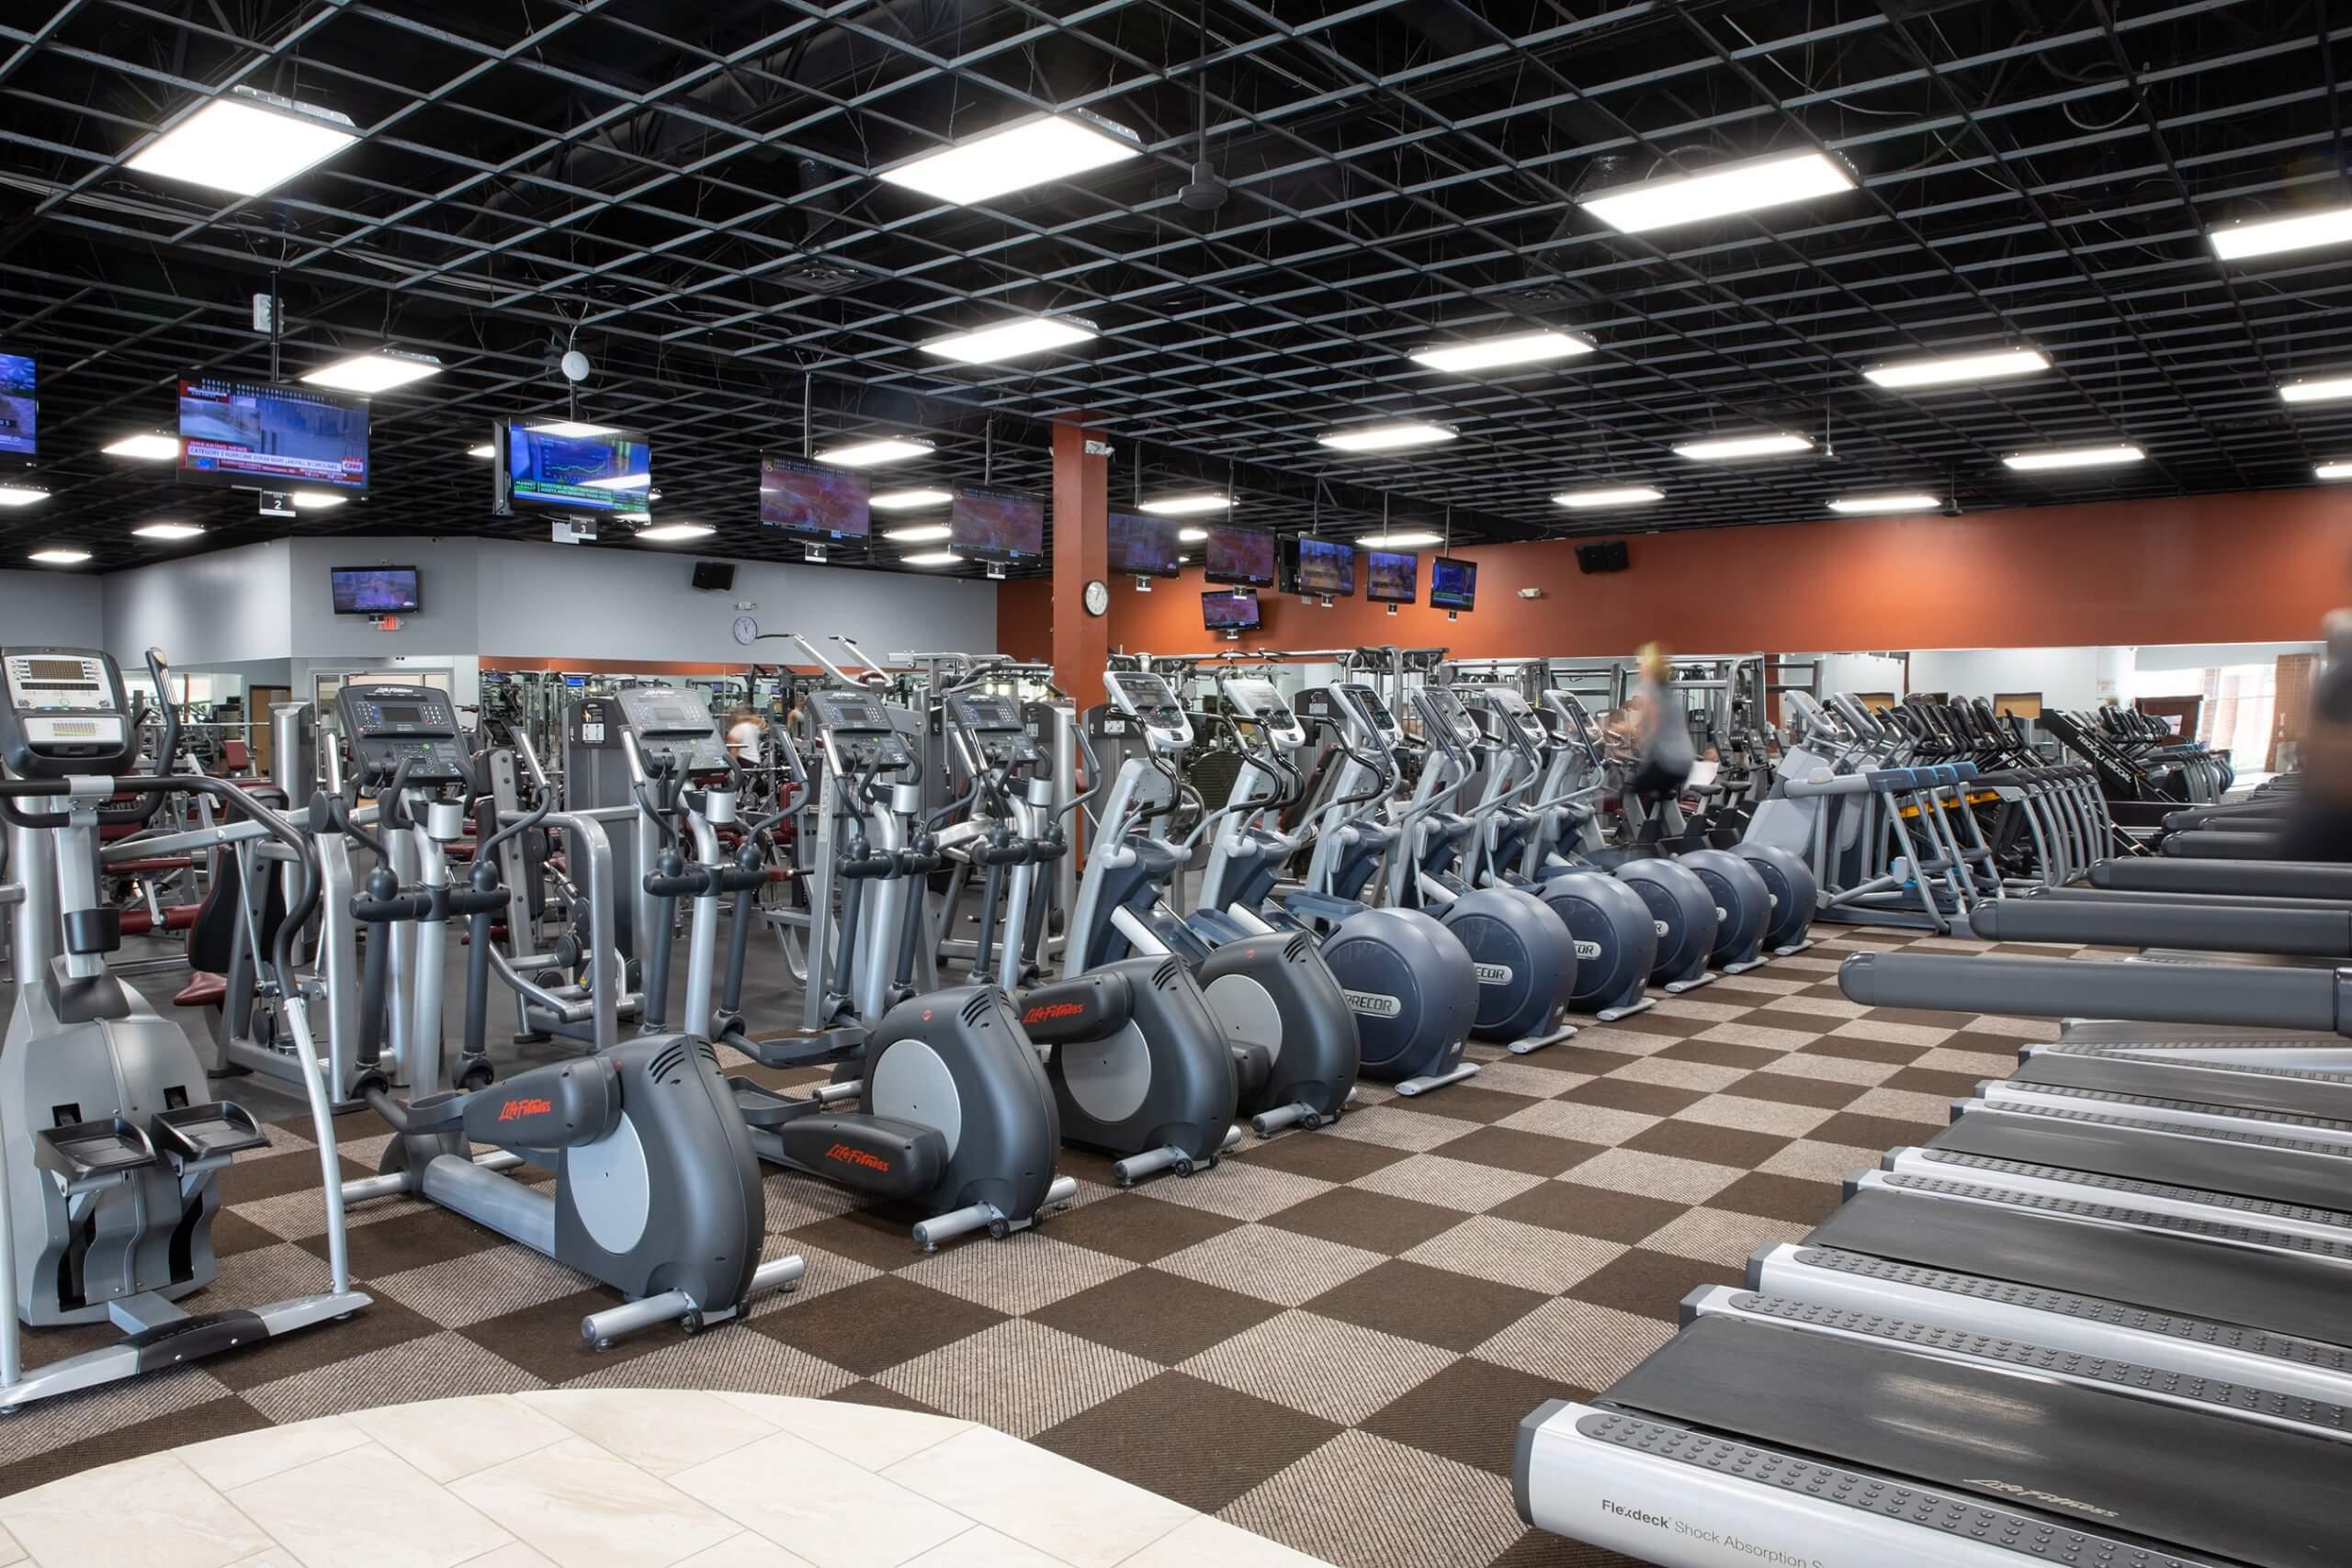 An Image of the Clarkston, MI Powerhouse Gym Location